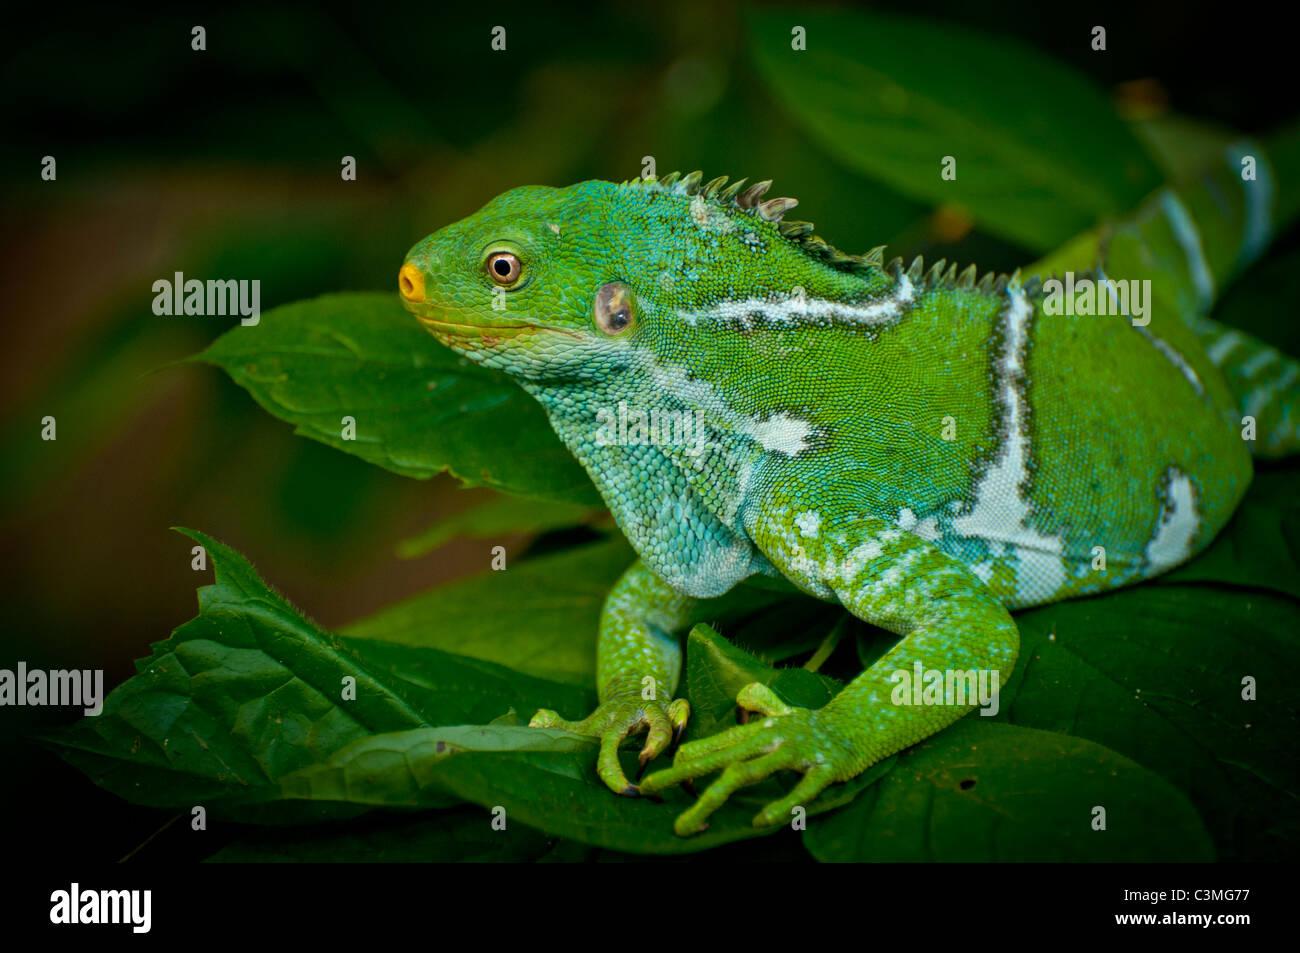 Crested Iguana, Kula Eco Park Sigatoka, Costa Coral ,Viti Levu Island Fiji Imagen De Stock